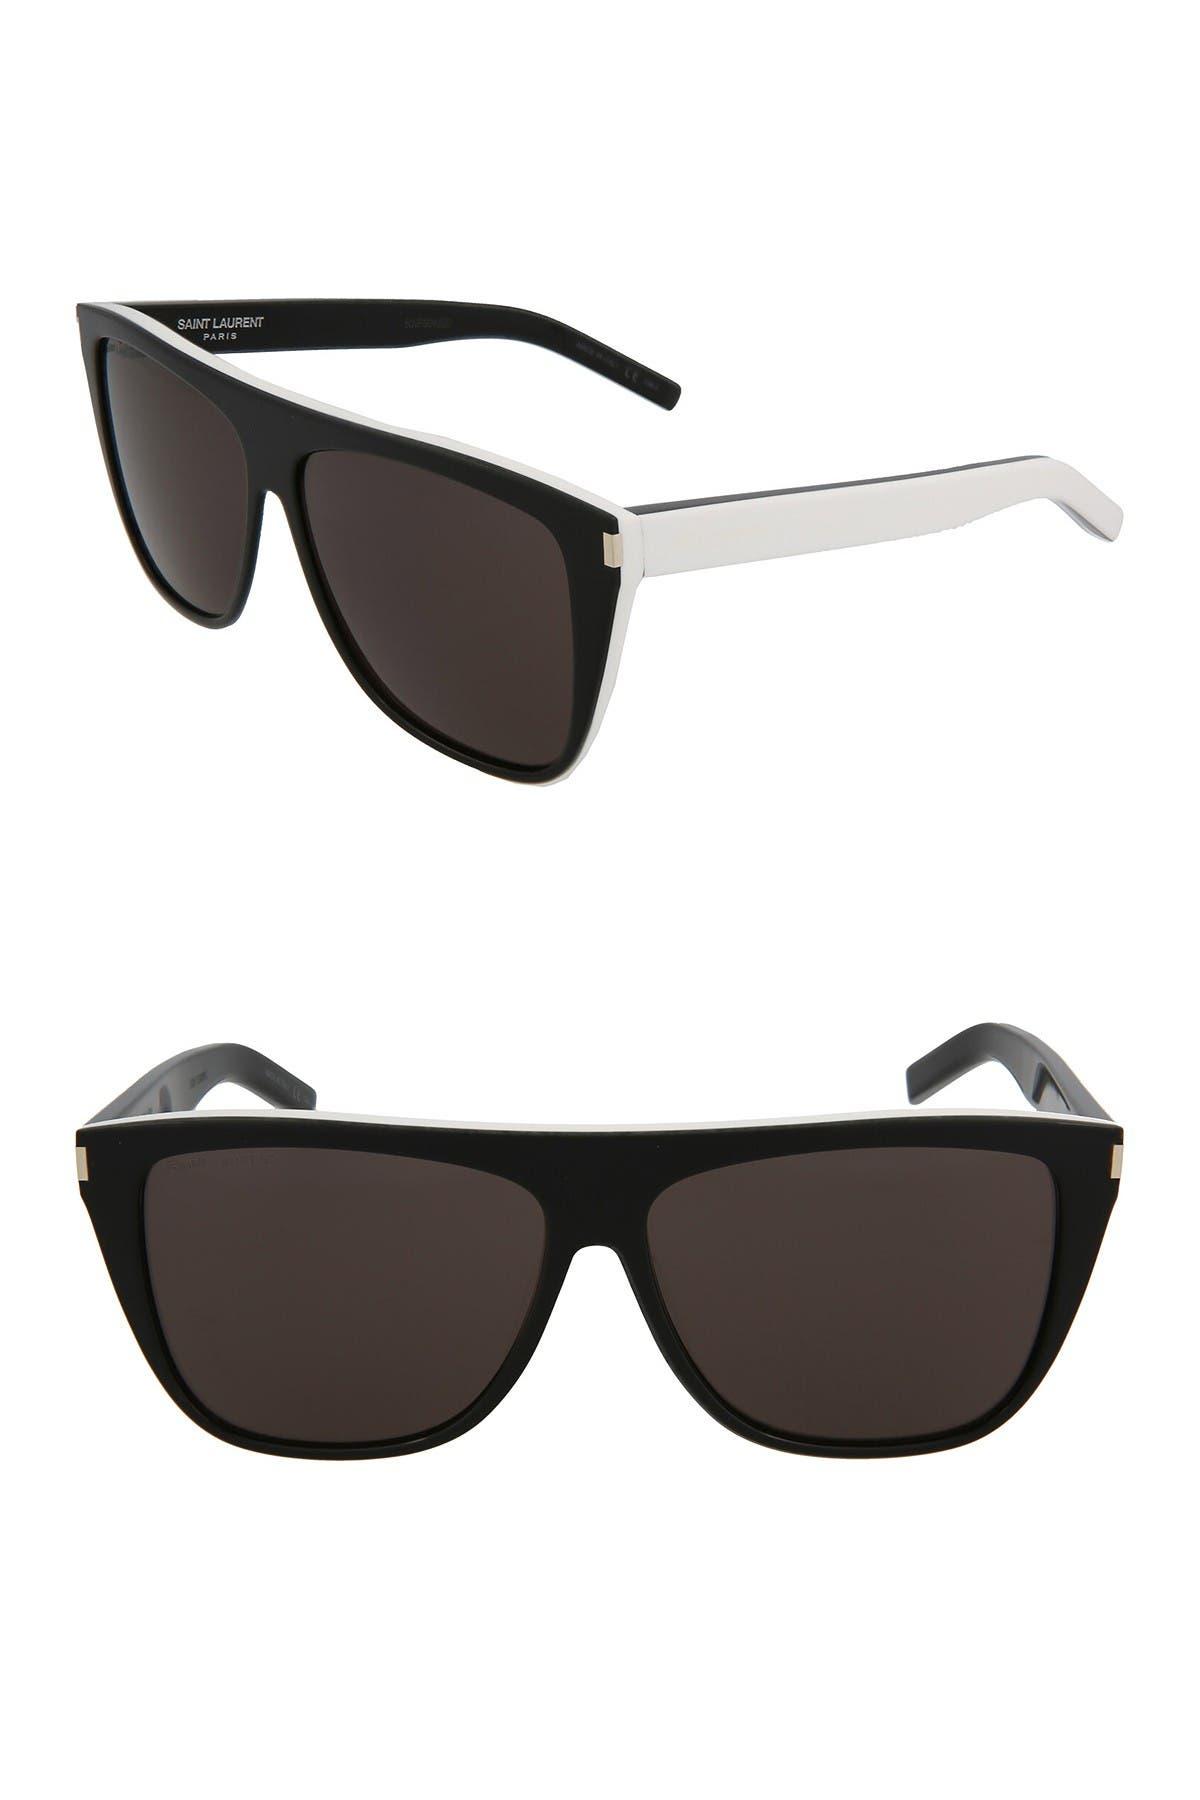 Image of Saint Laurent 59mm Shield Sunglasses